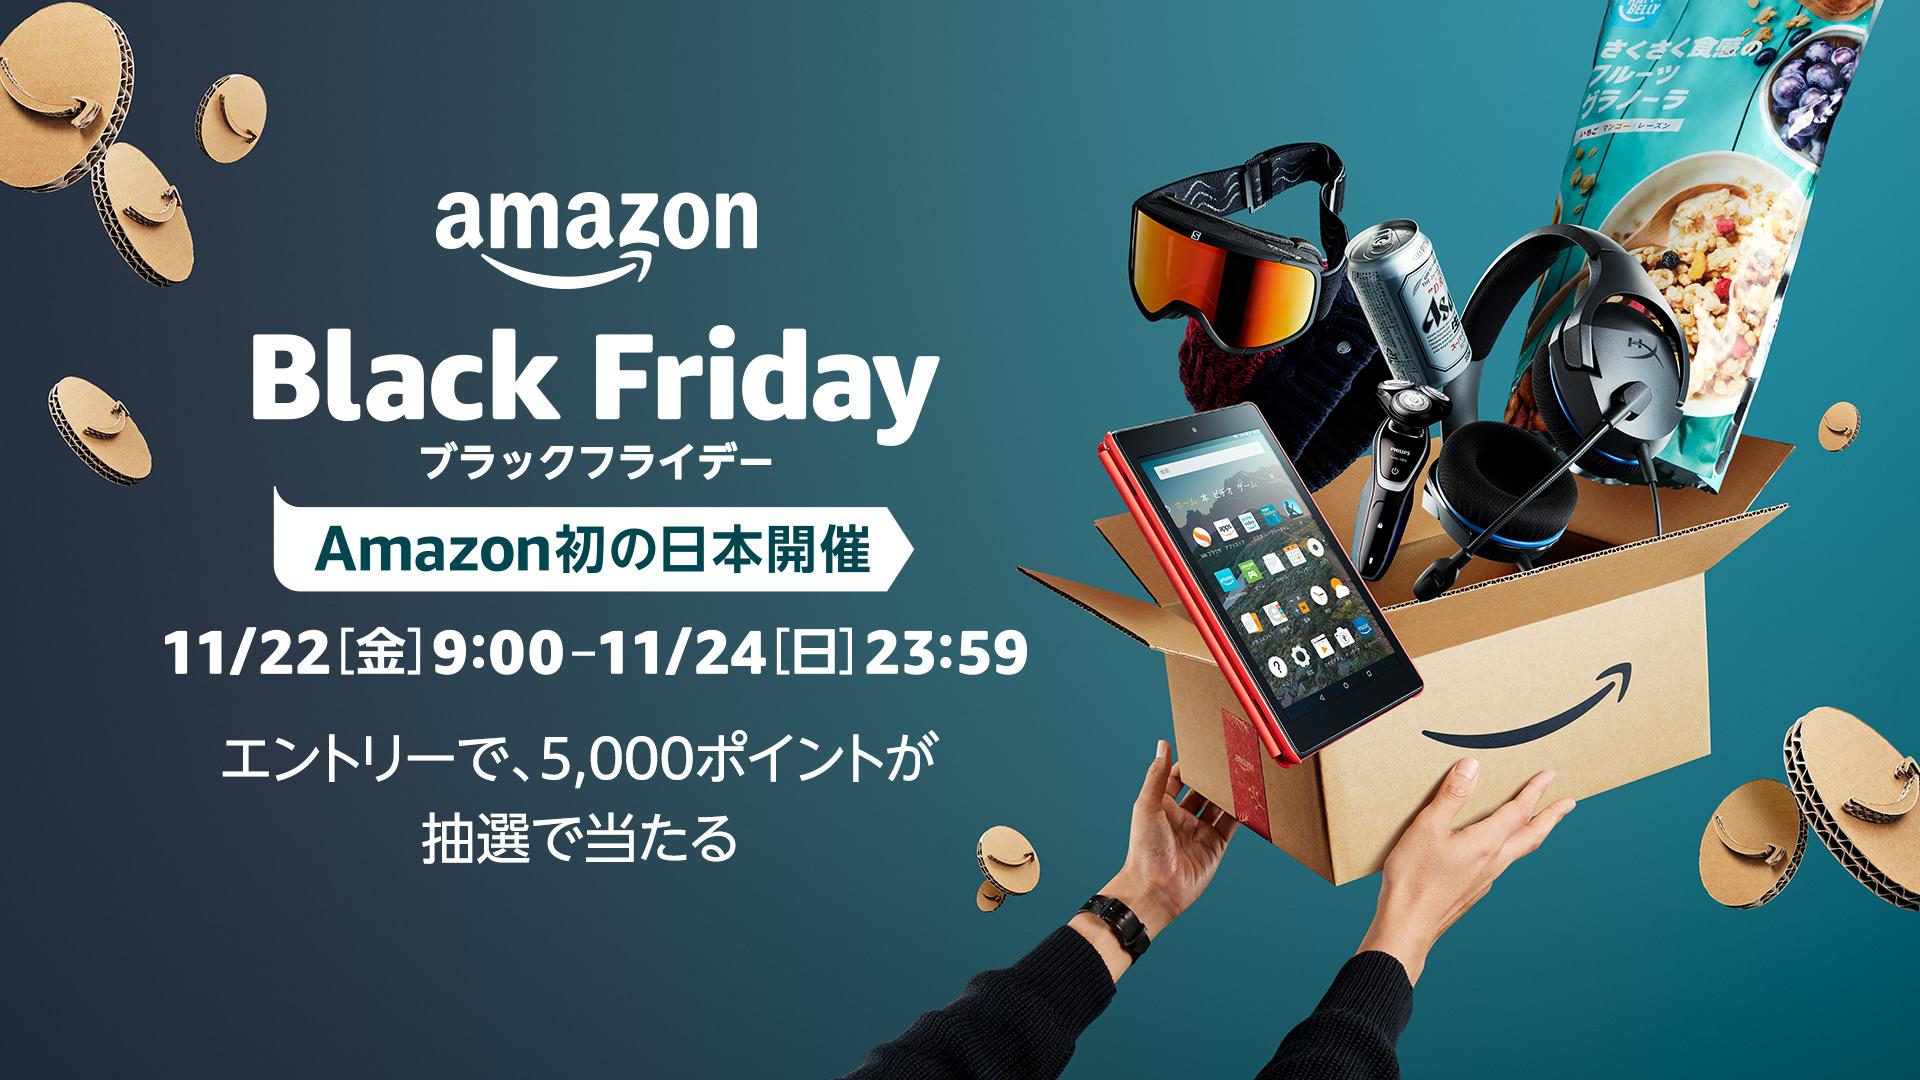 Amazonブラックフライデー広告画像